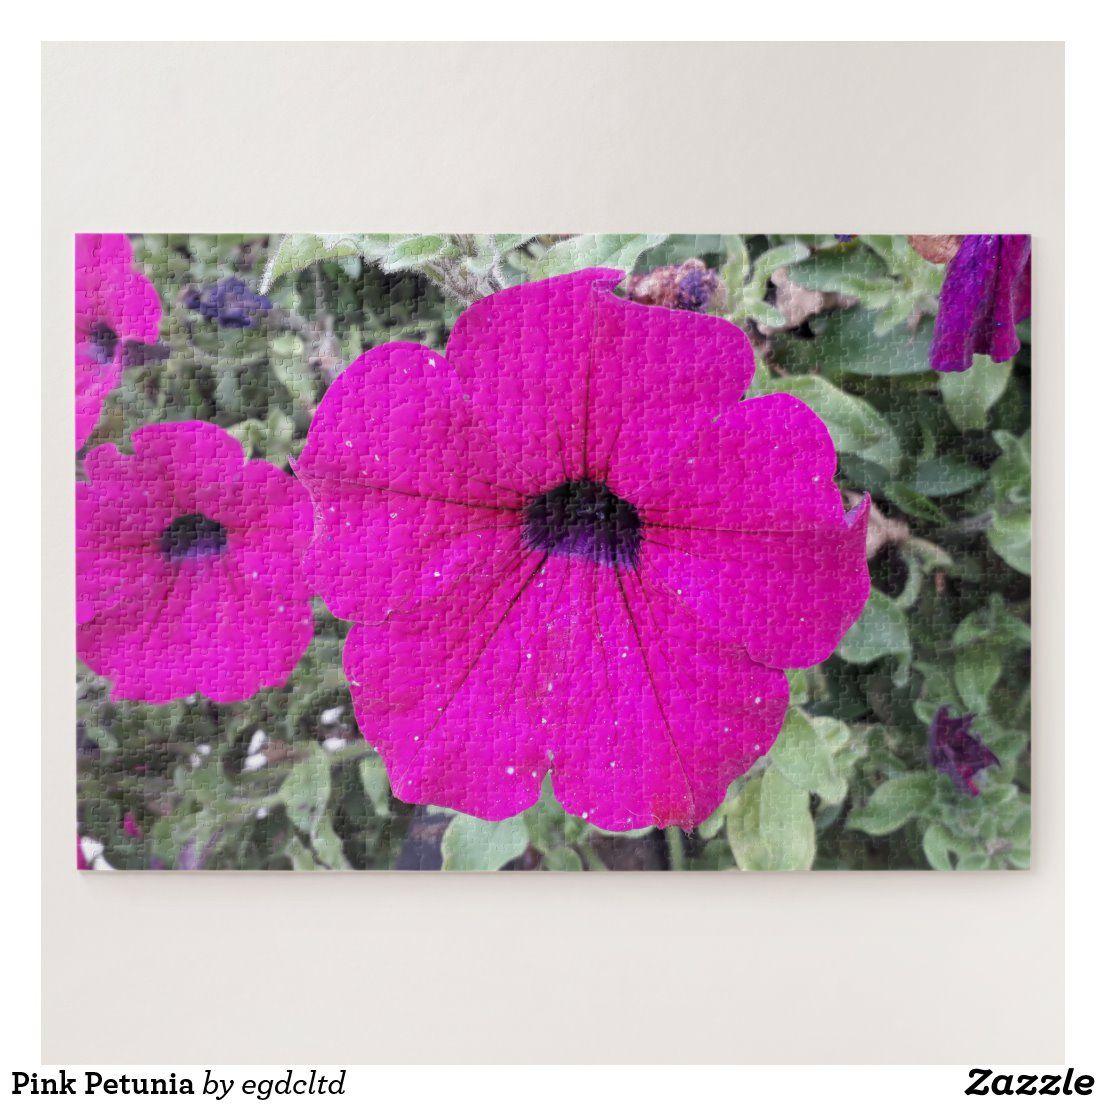 Pink Petunia Jigsaw Puzzle Zazzle Com In 2020 Petunias Jigsaw